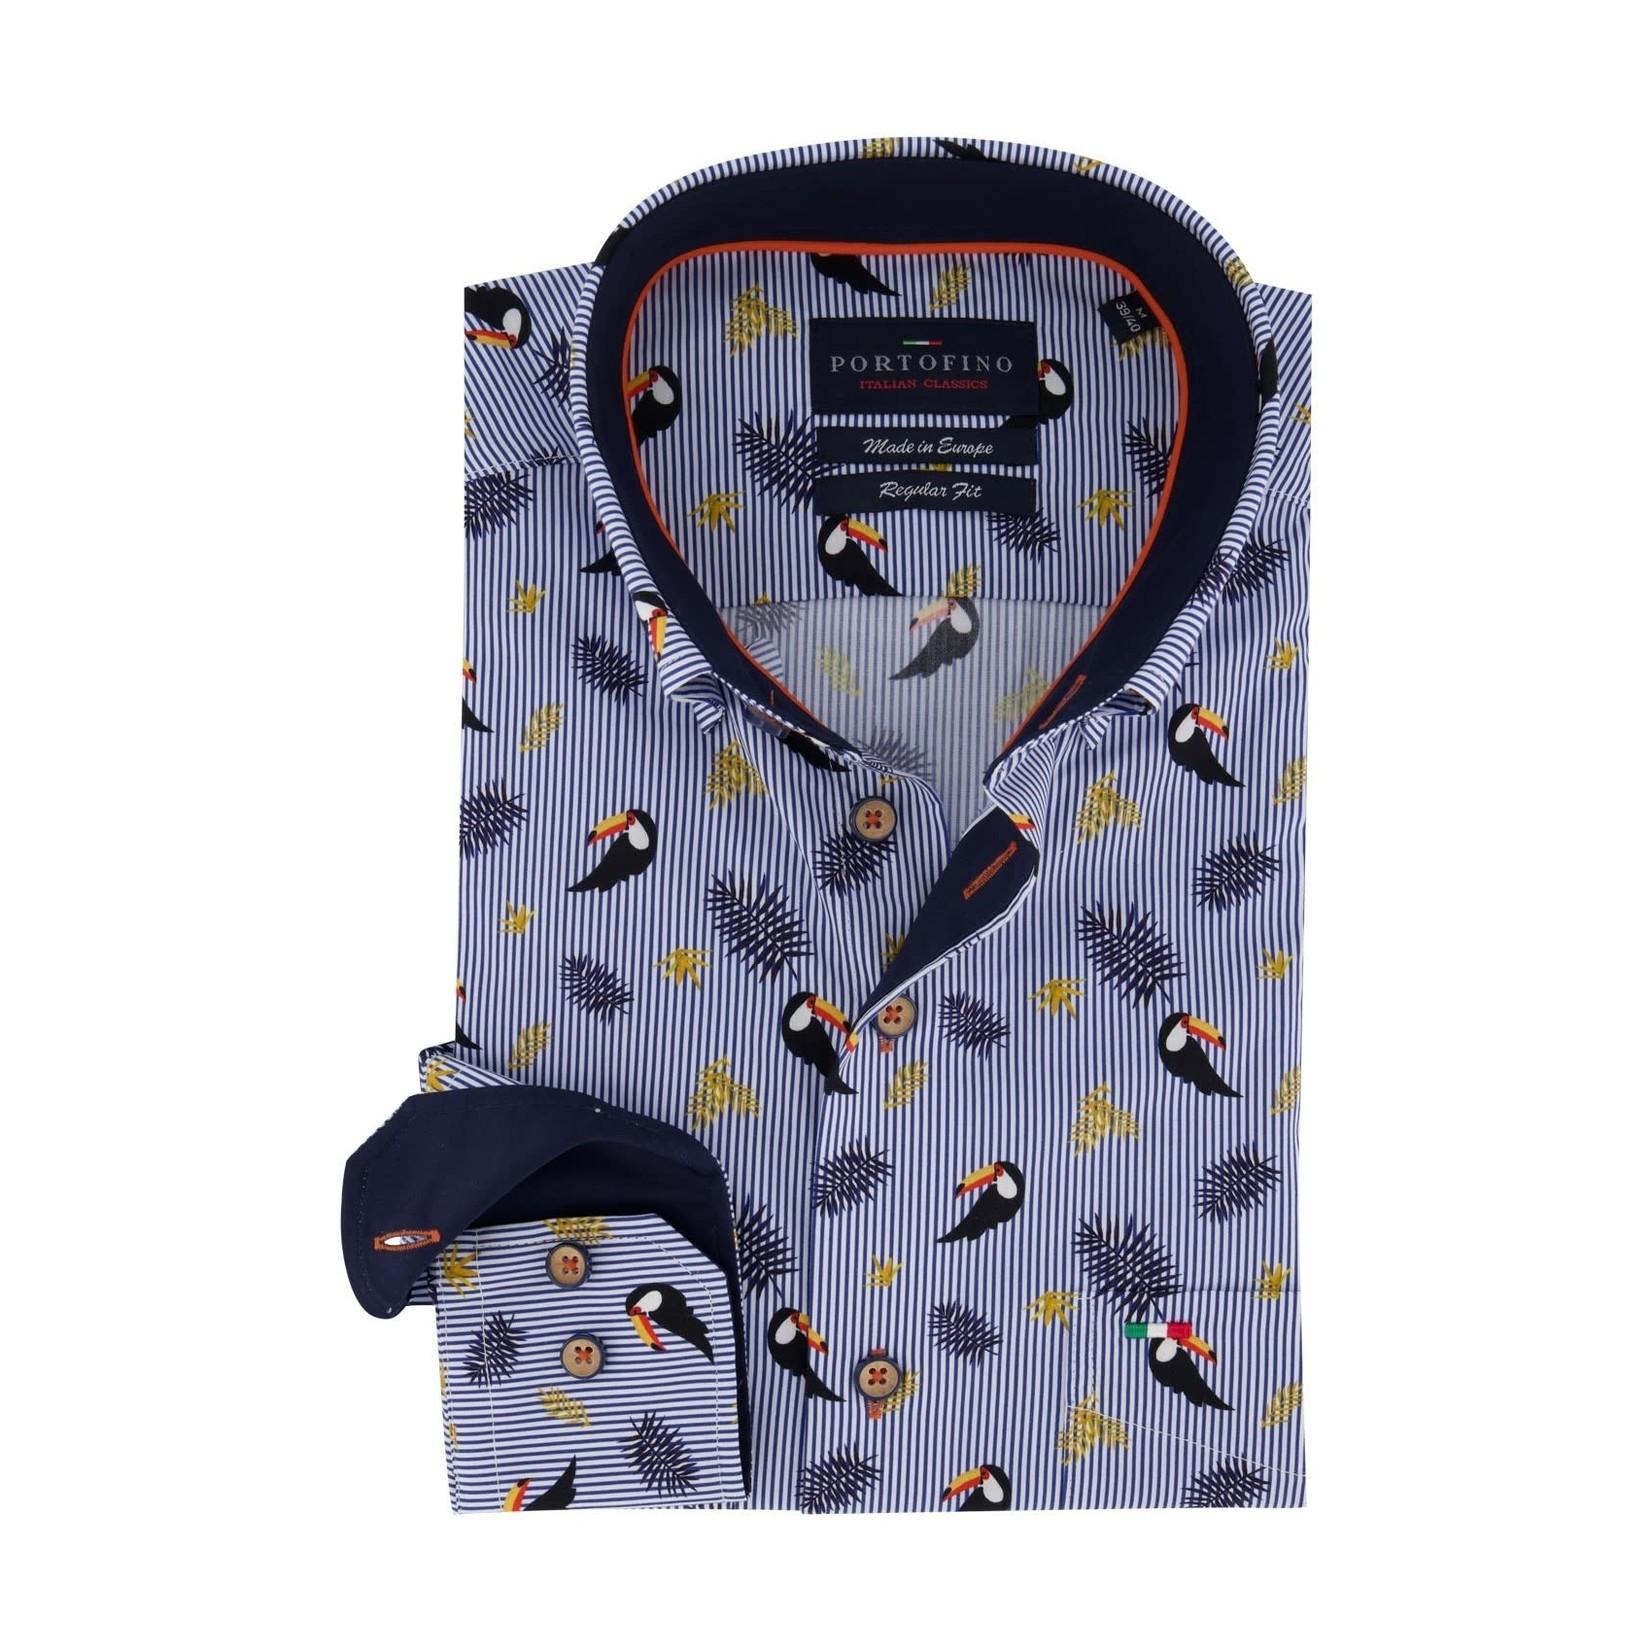 Portofino overhemd regular fit toekan print